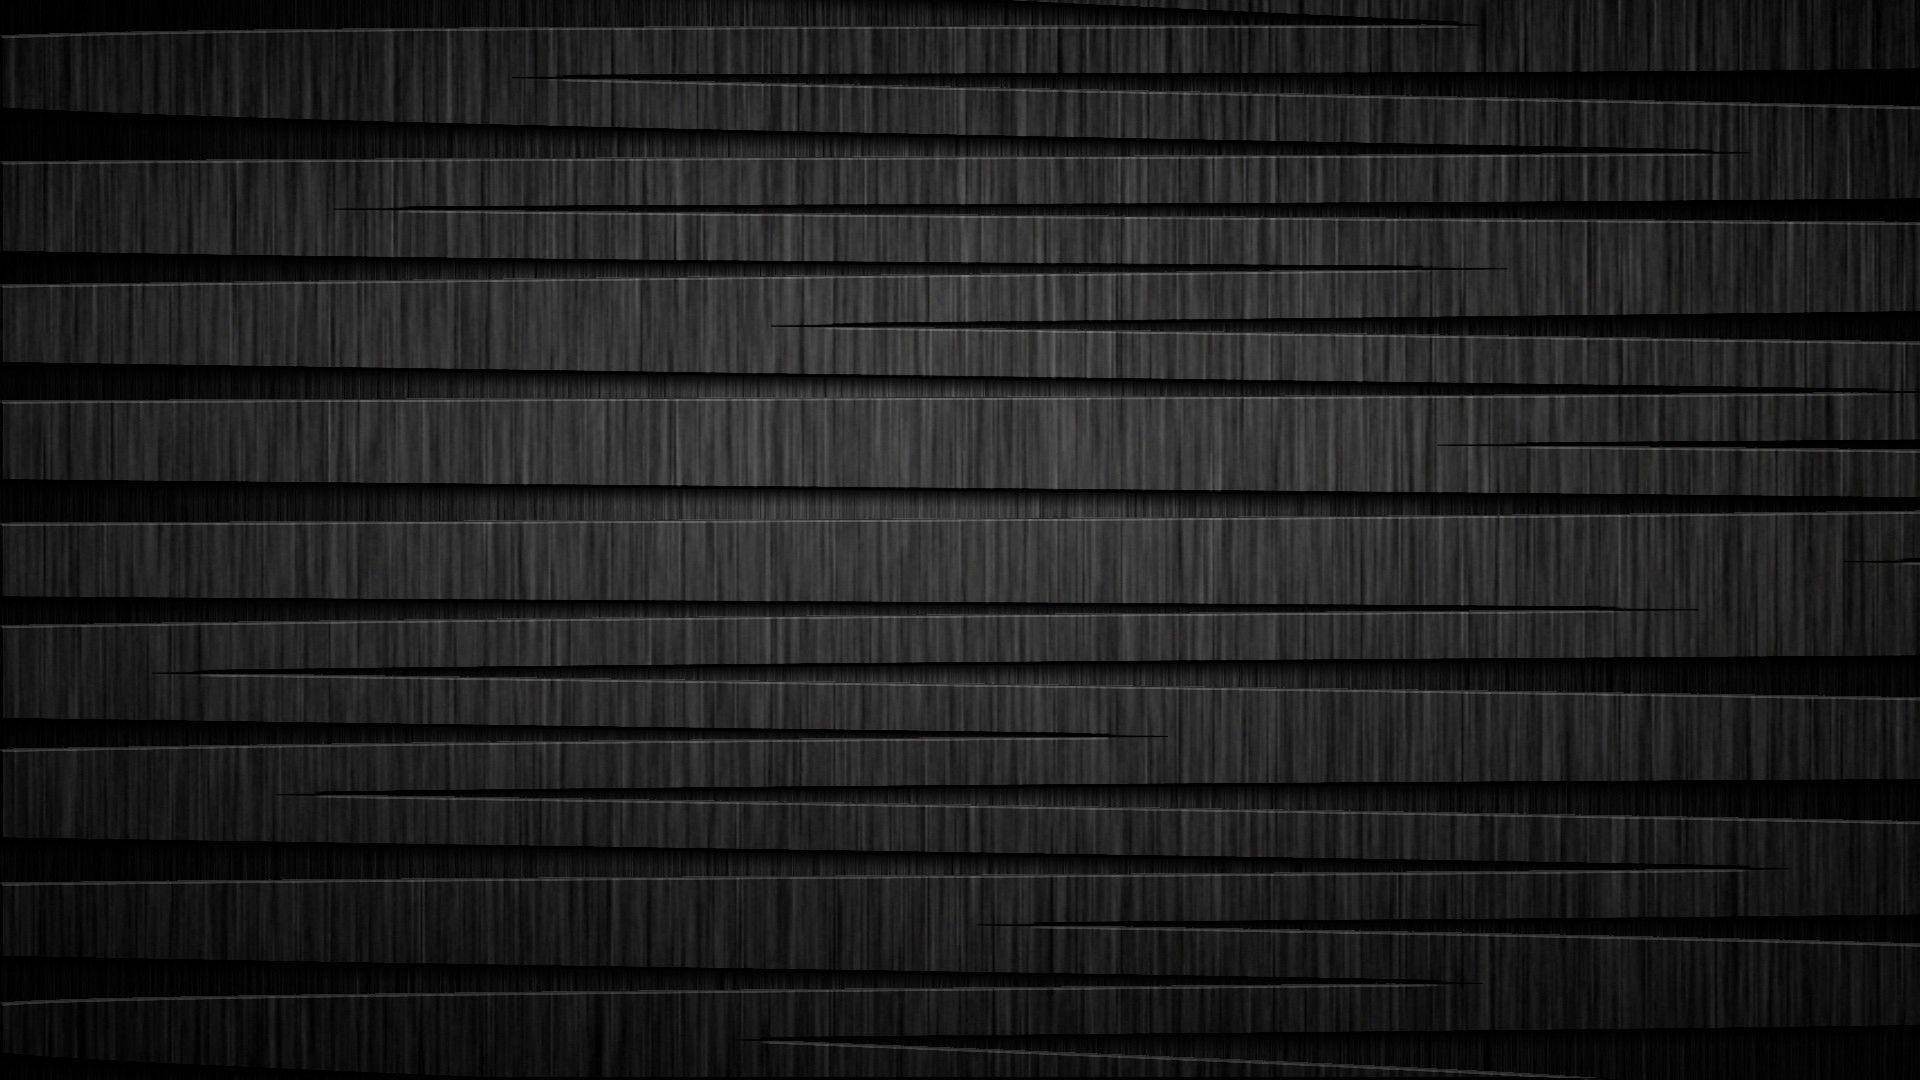 black texture wallpaper 1920x1080 - photo #29